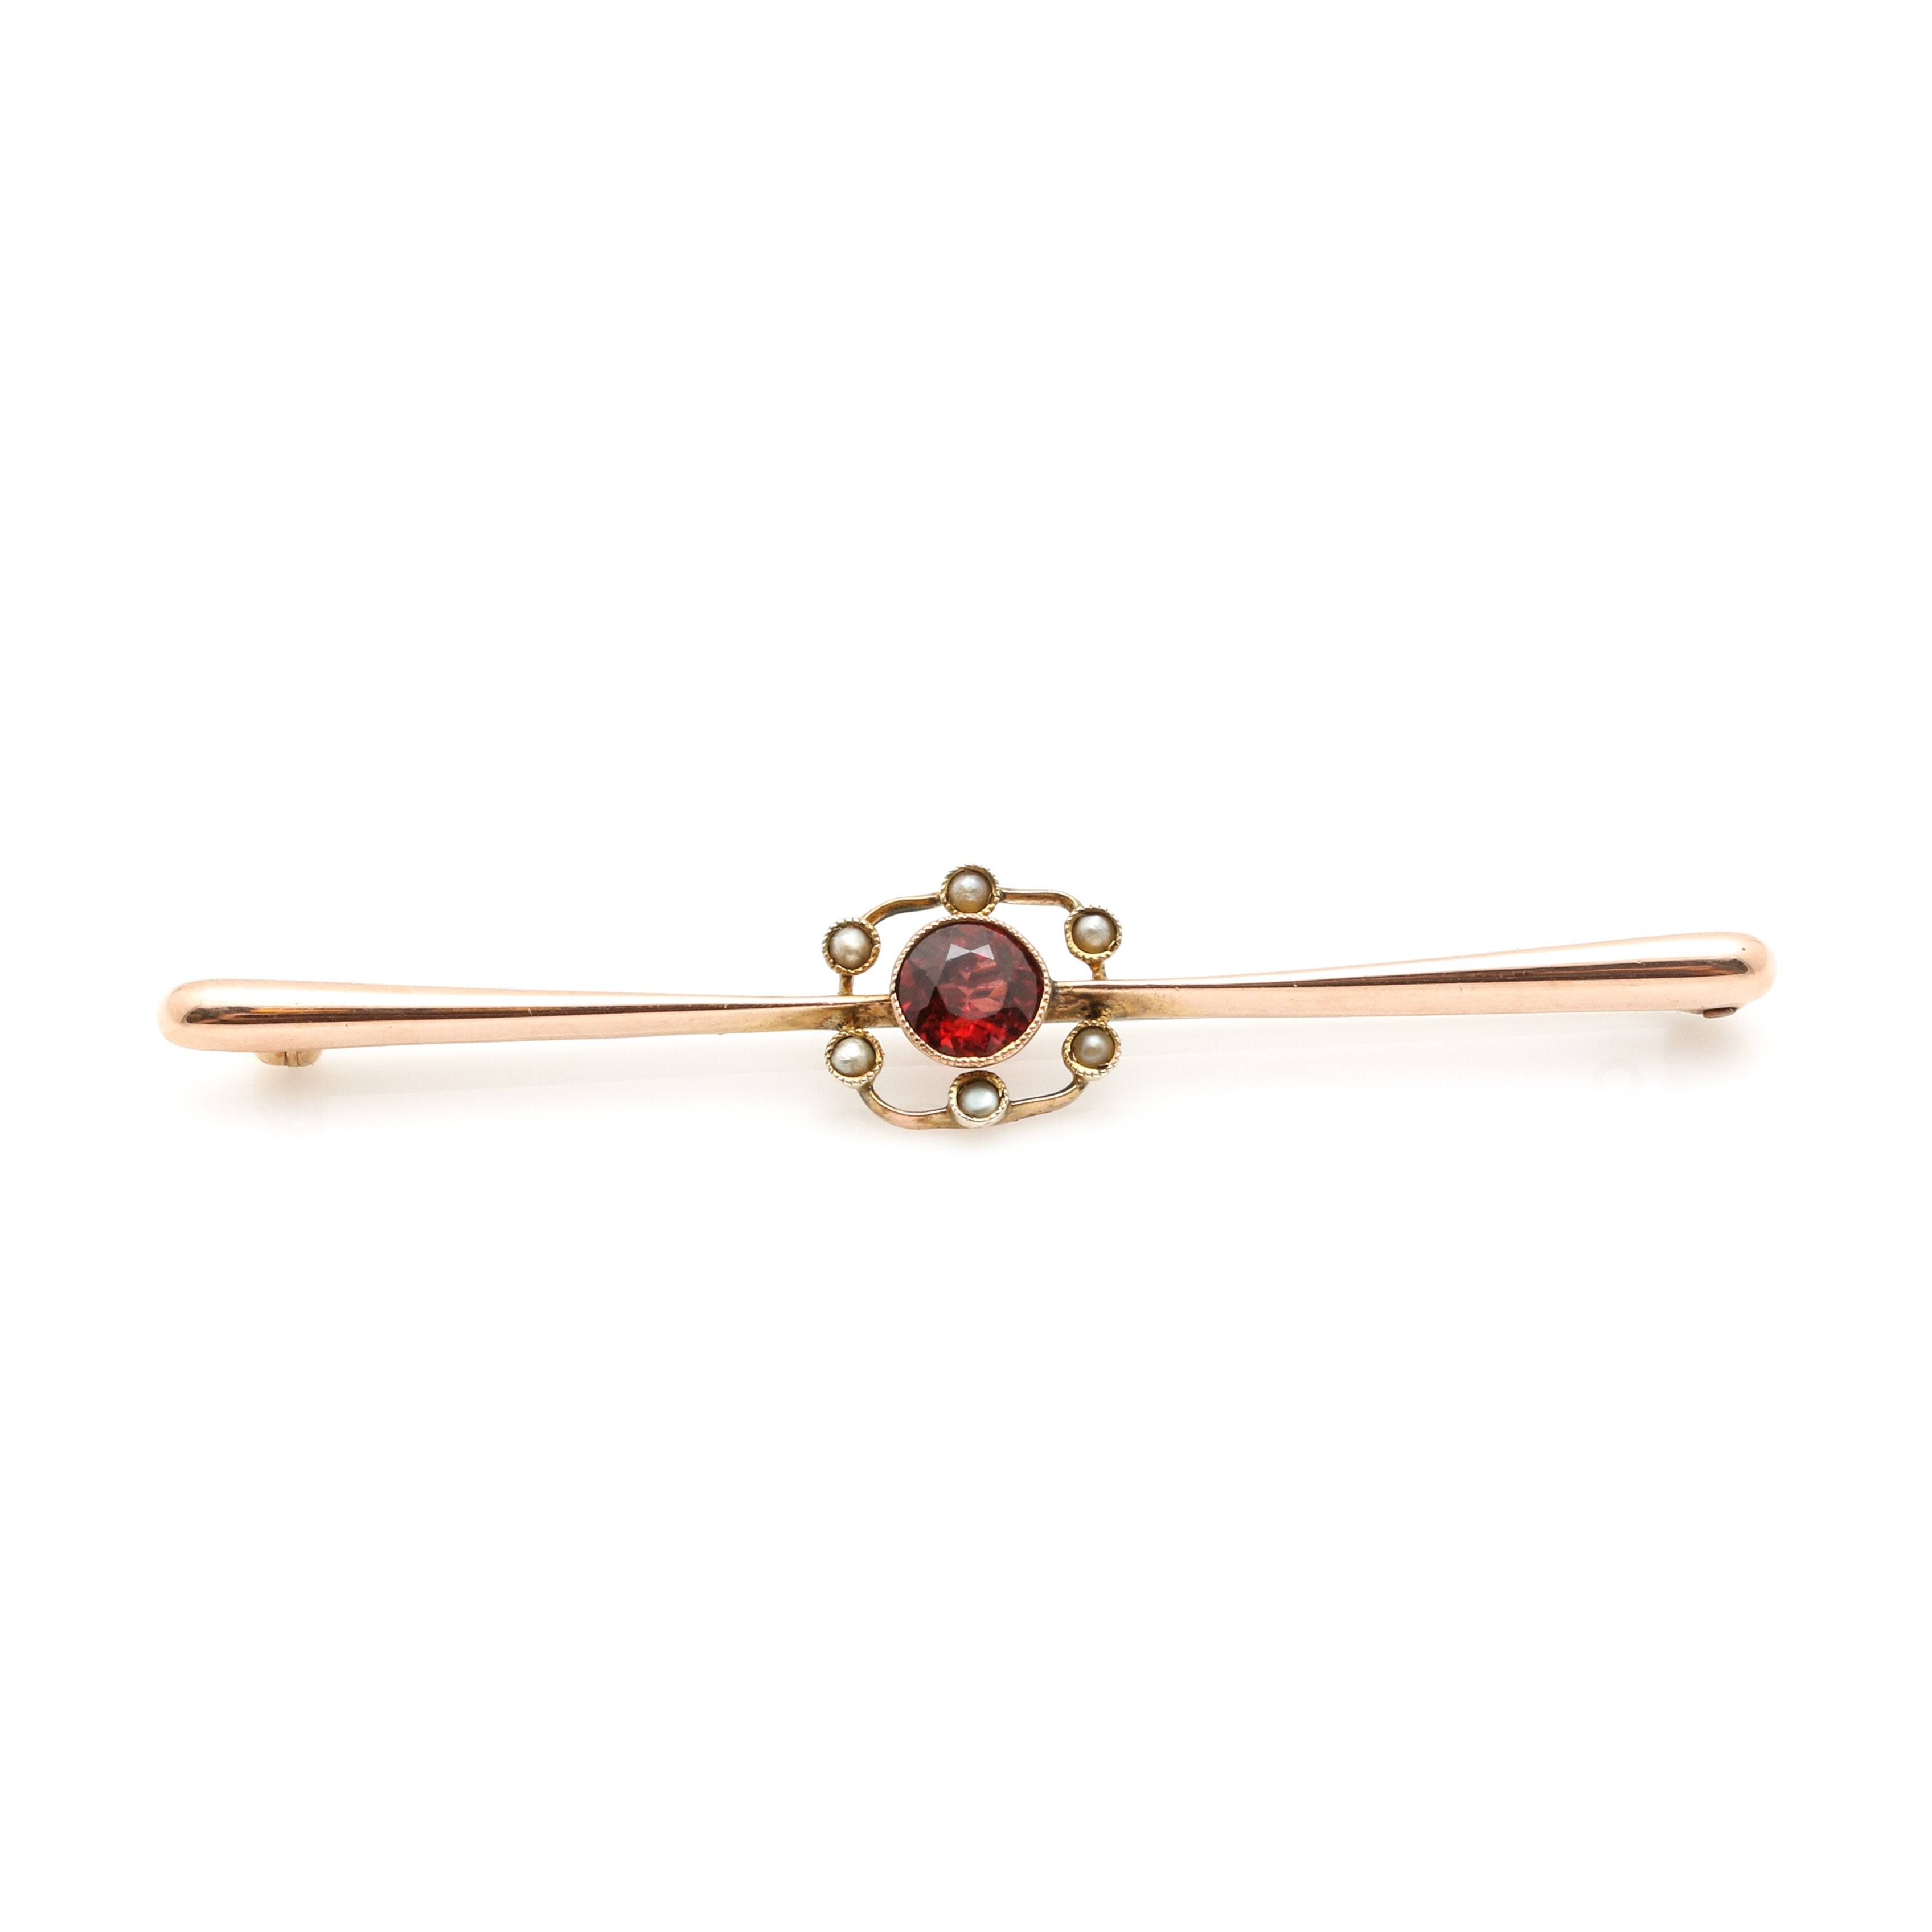 9K Rose Gold Garnet and Seed Pearl Bar Converter Brooch